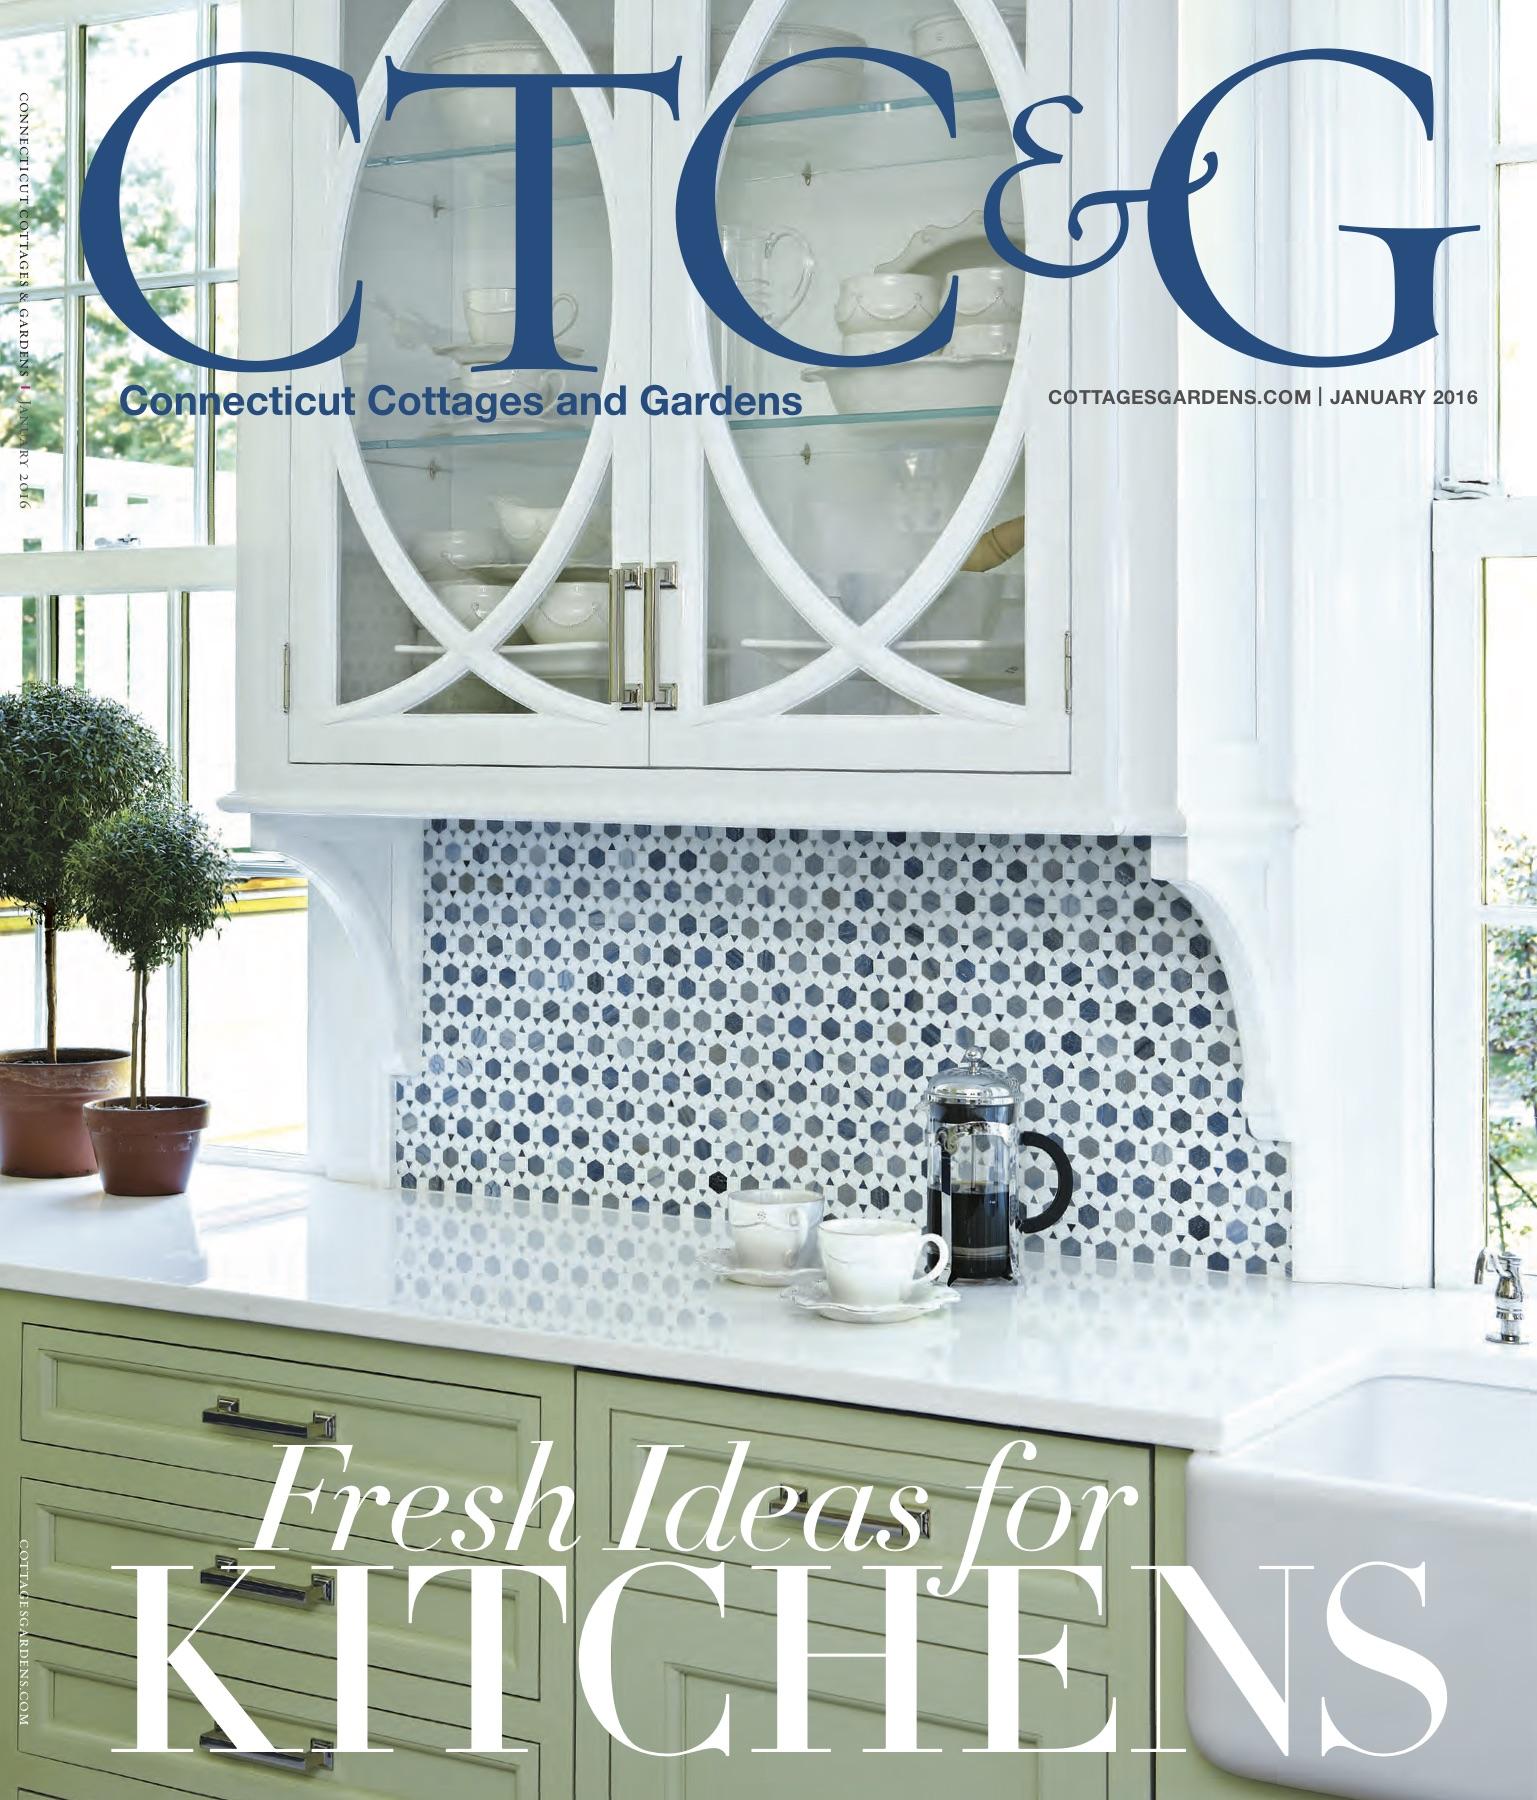 CTC&G Pretty Please Kitchens 0116.jpg